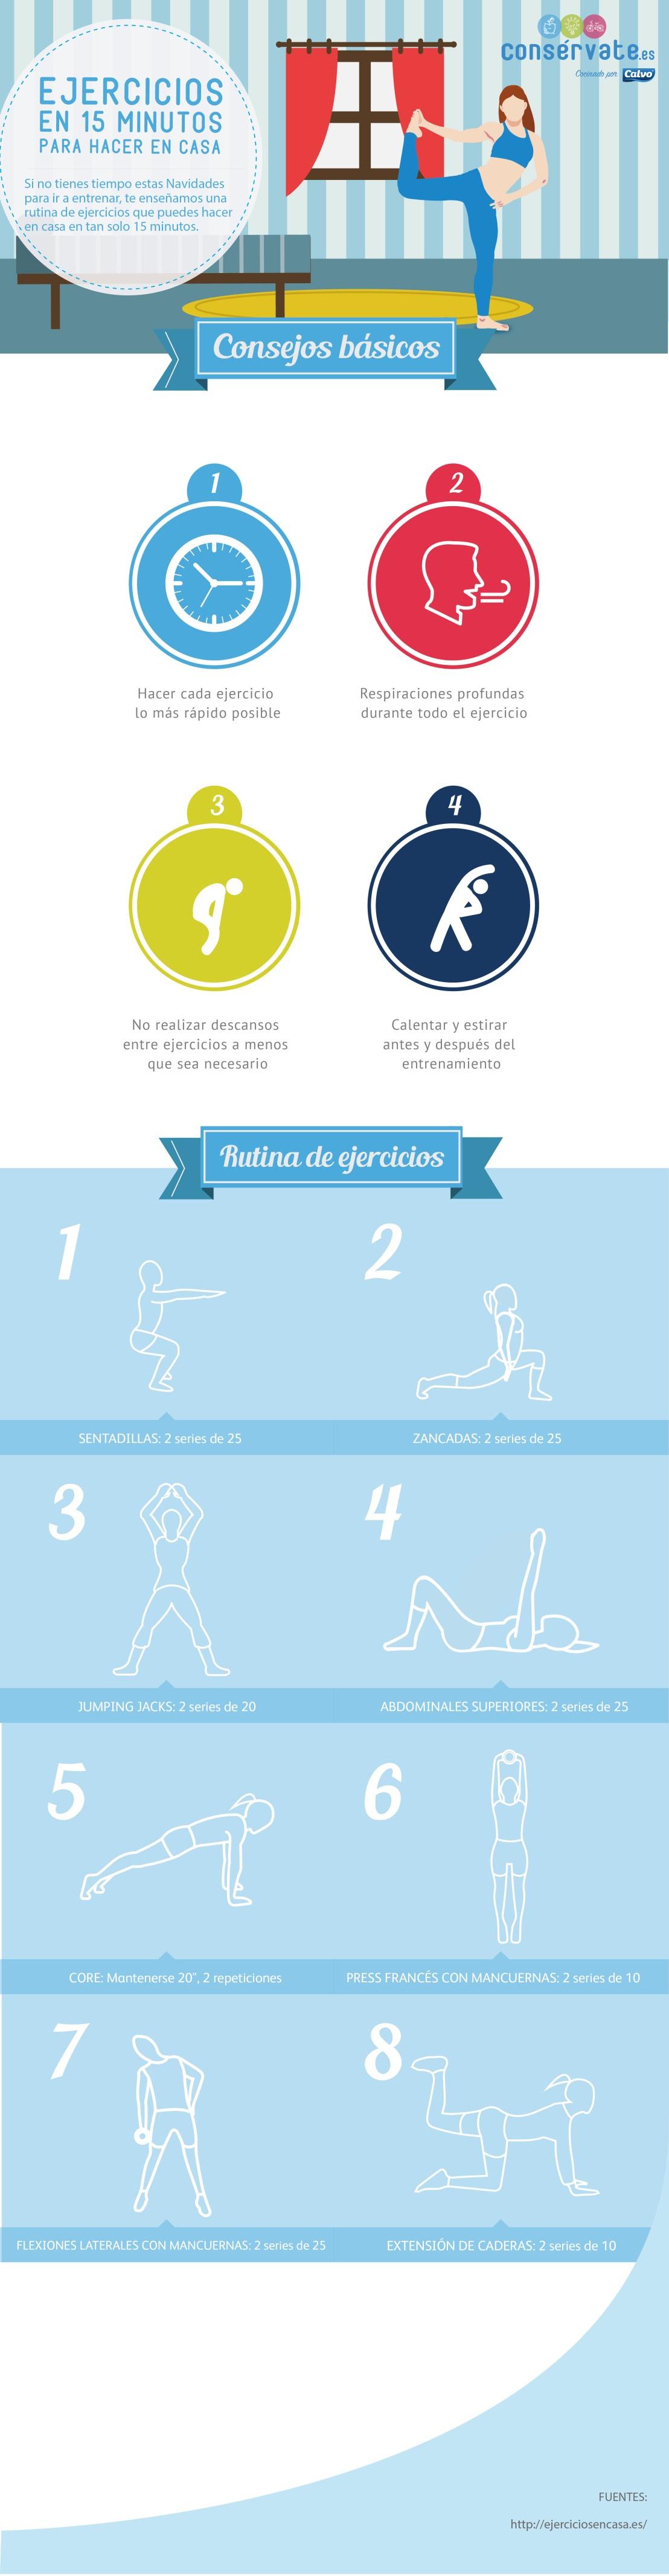 ejercicios-15-minutos-para-hacer-en-casa-infografia